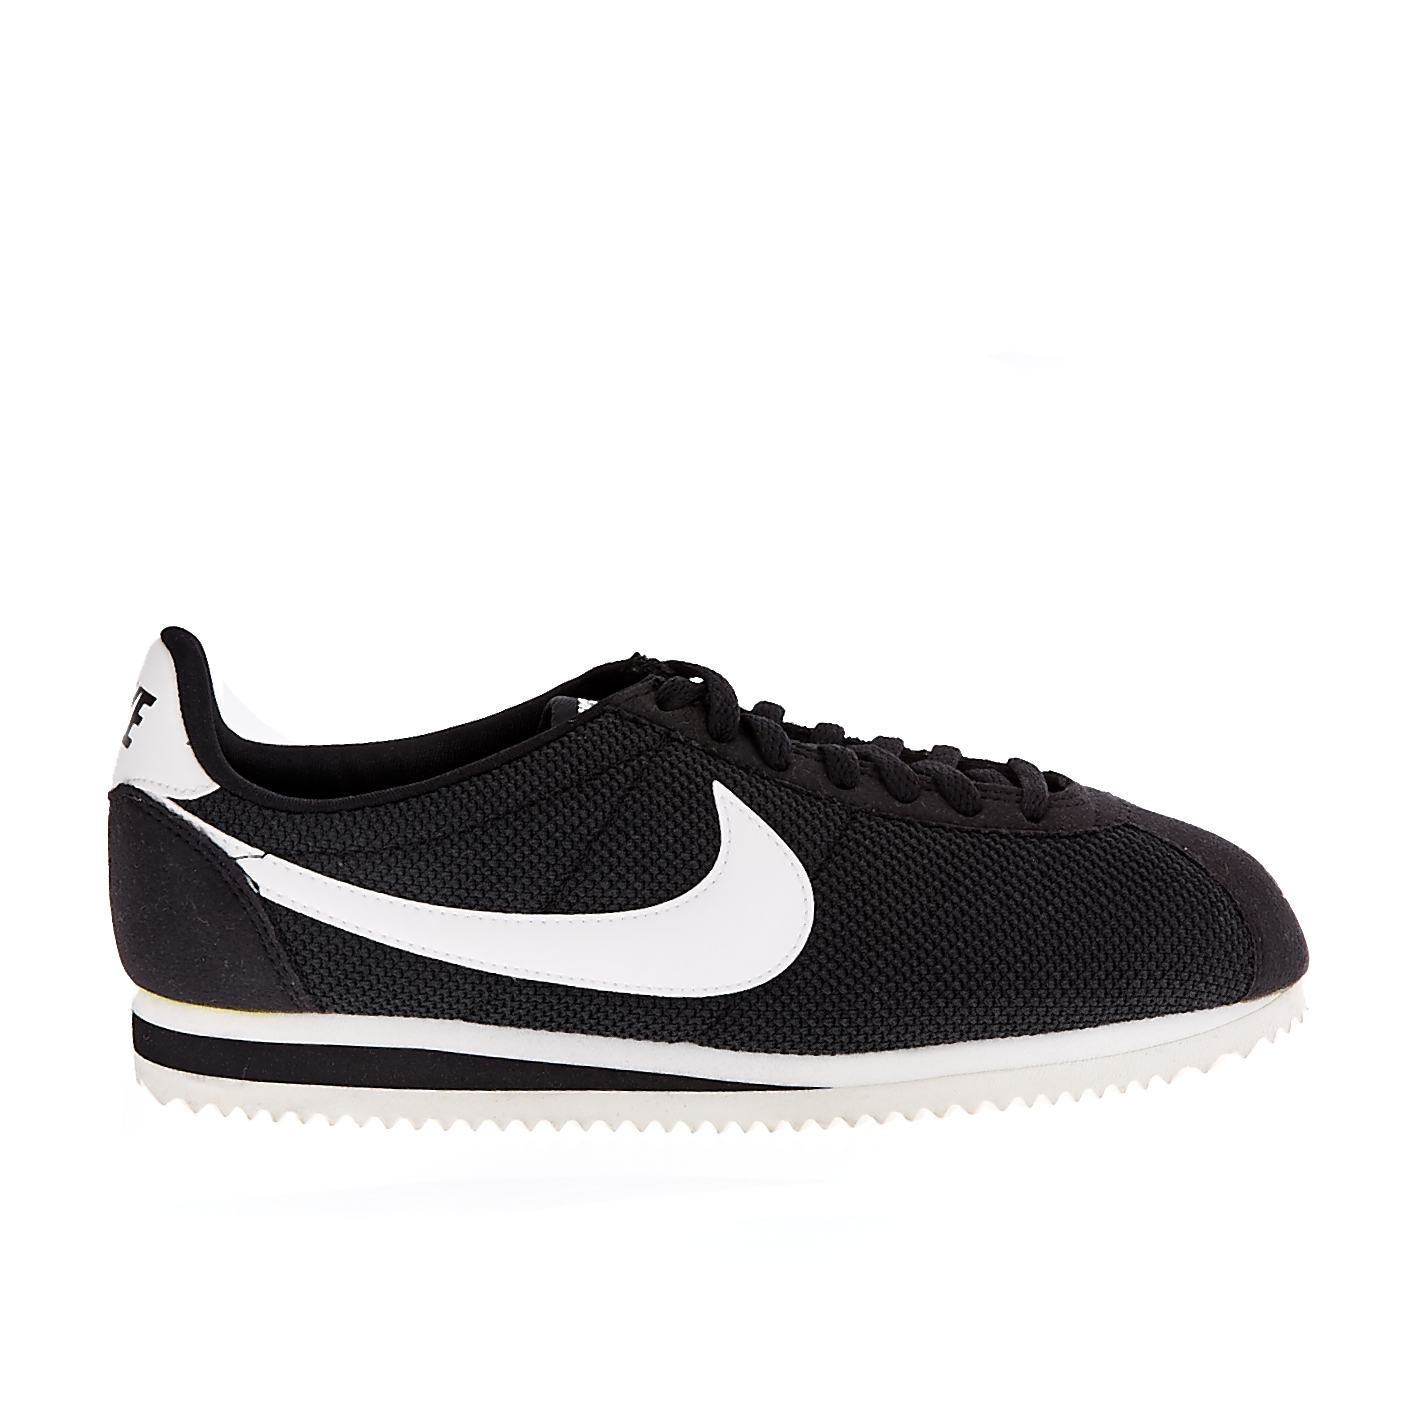 NIKE - Γυναικεία αθλητικά παπούτσια CLASSIC CORTEZ NYLON μαύρα γυναικεία παπούτσια αθλητικά running